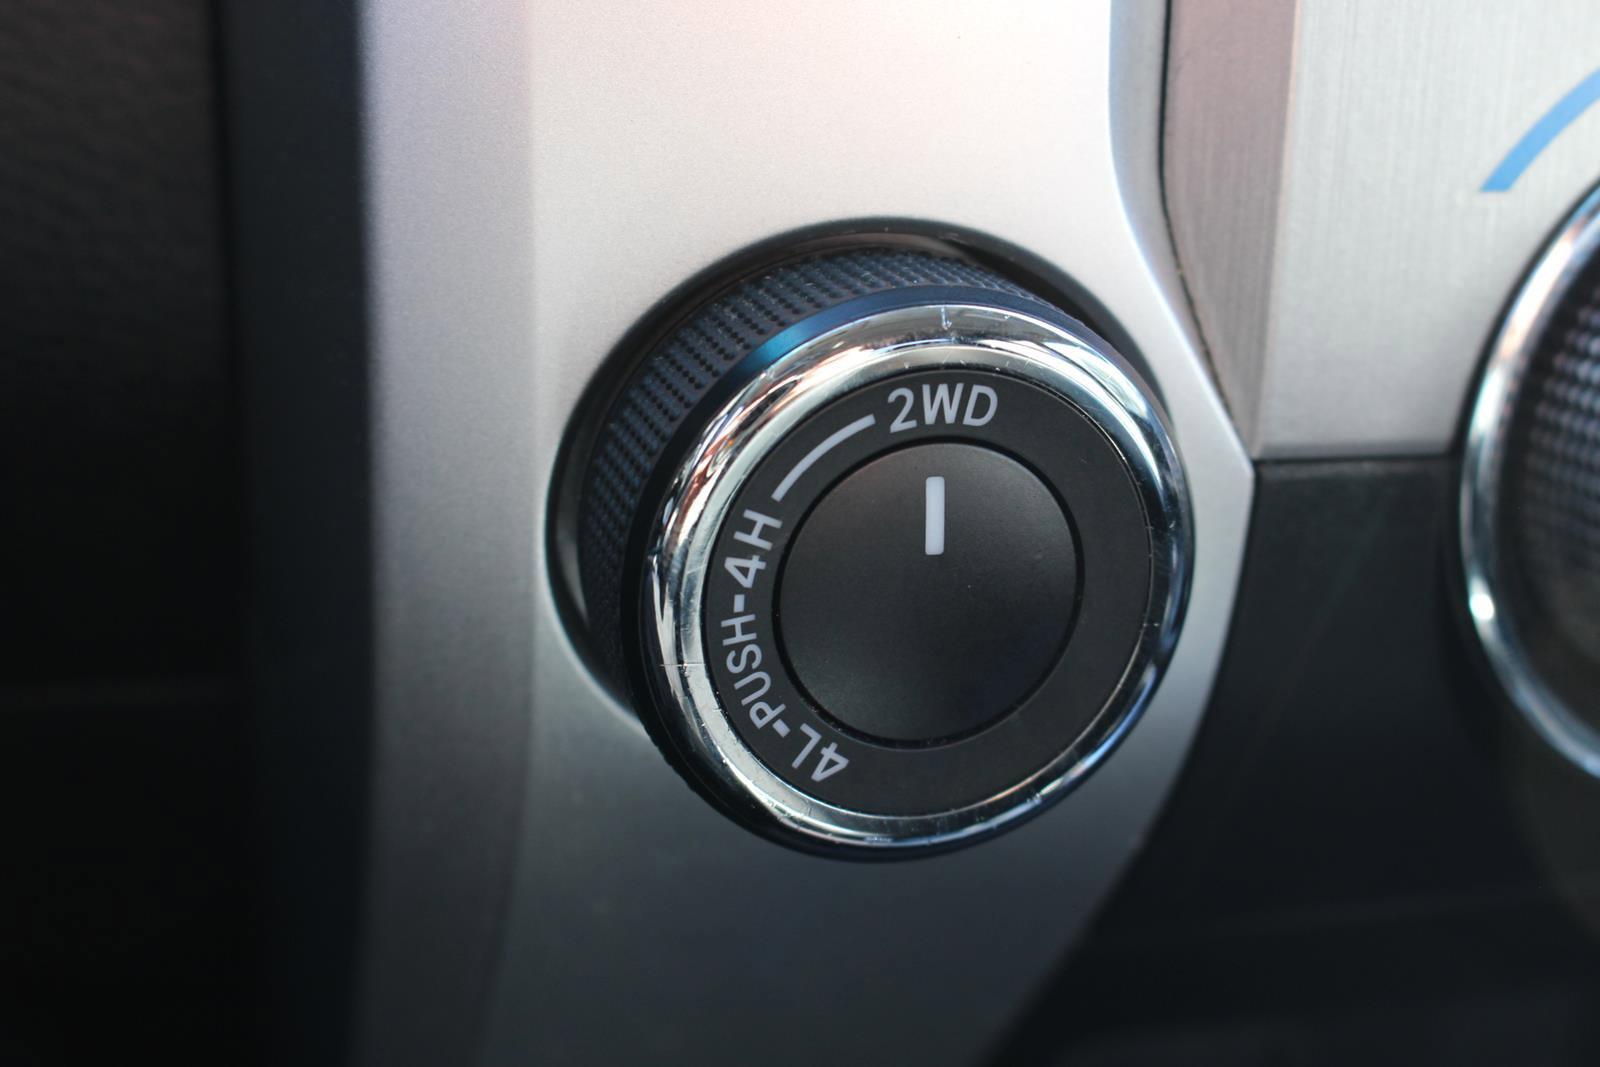 Pre-Owned 2016 Toyota Tundra 4WD Truck LTD